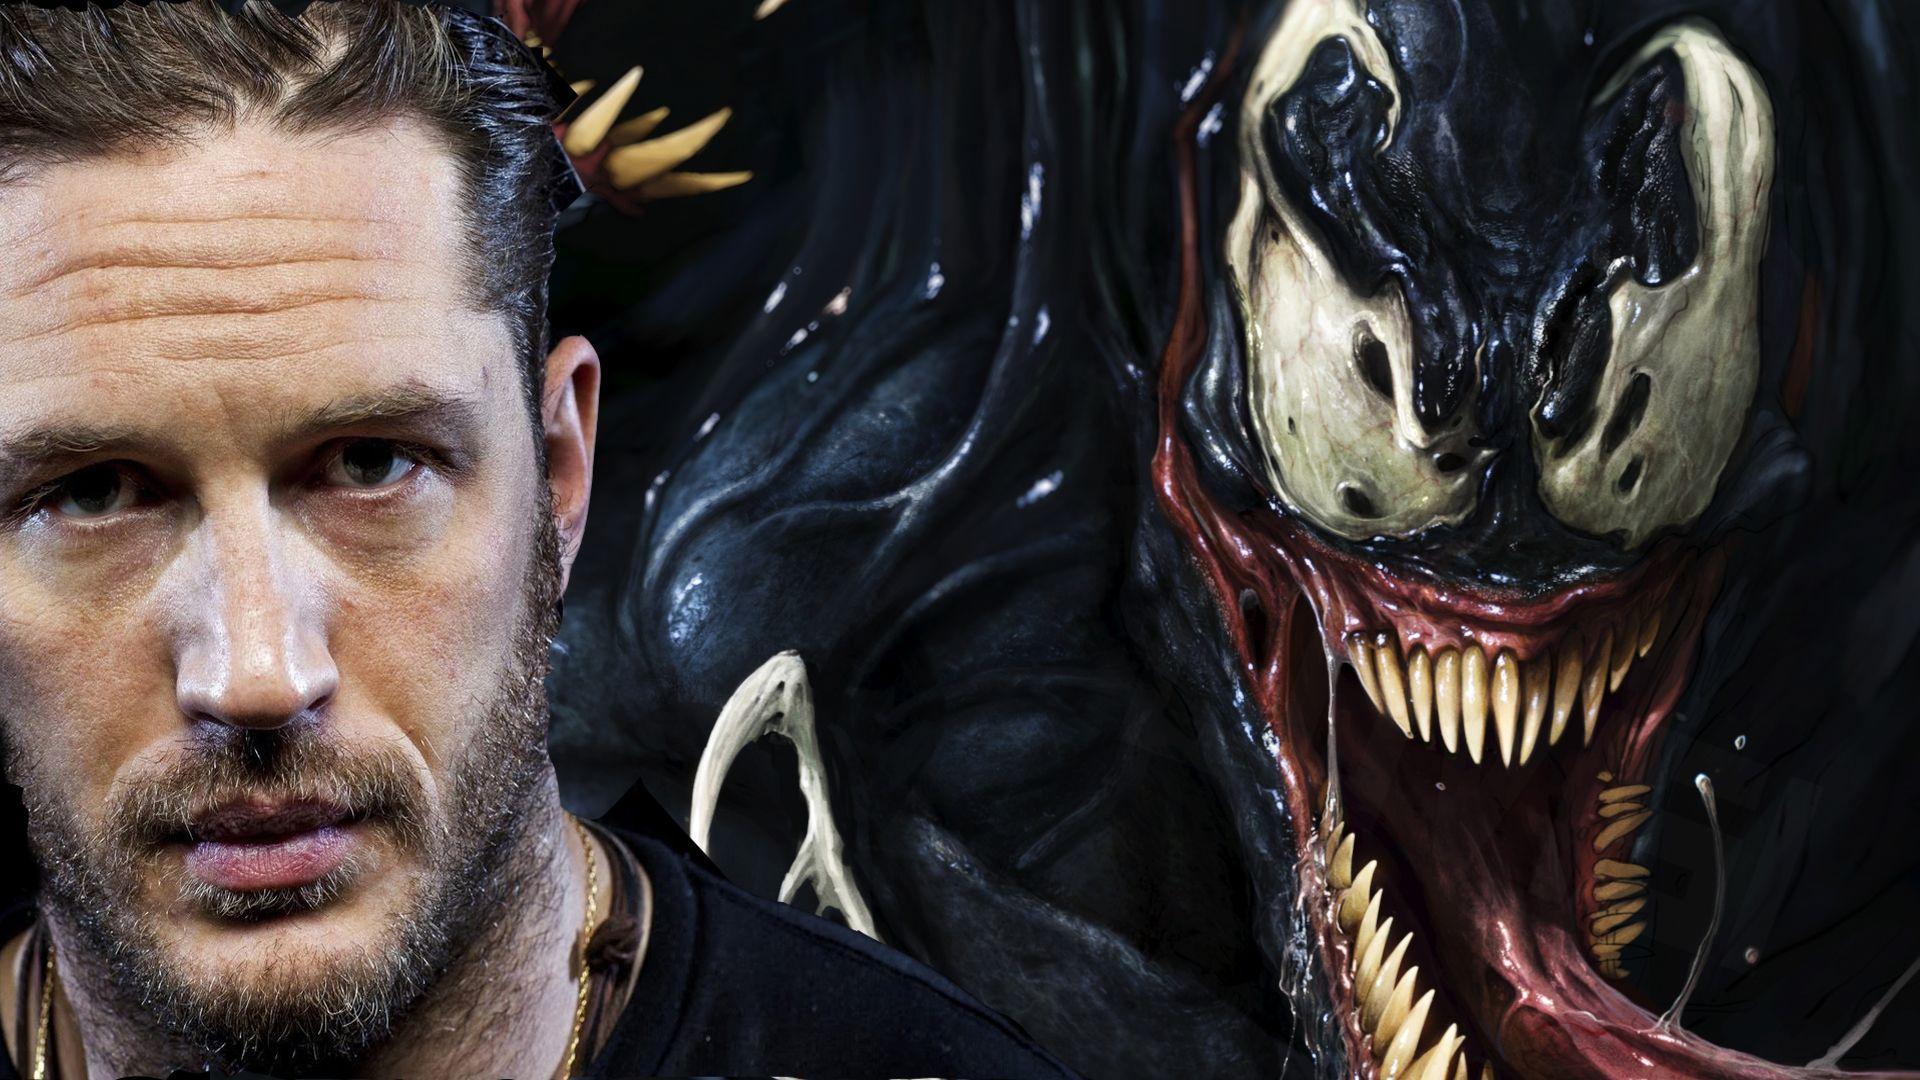 Venom Tom Hardy Wallpapers - Wallpaper Cave